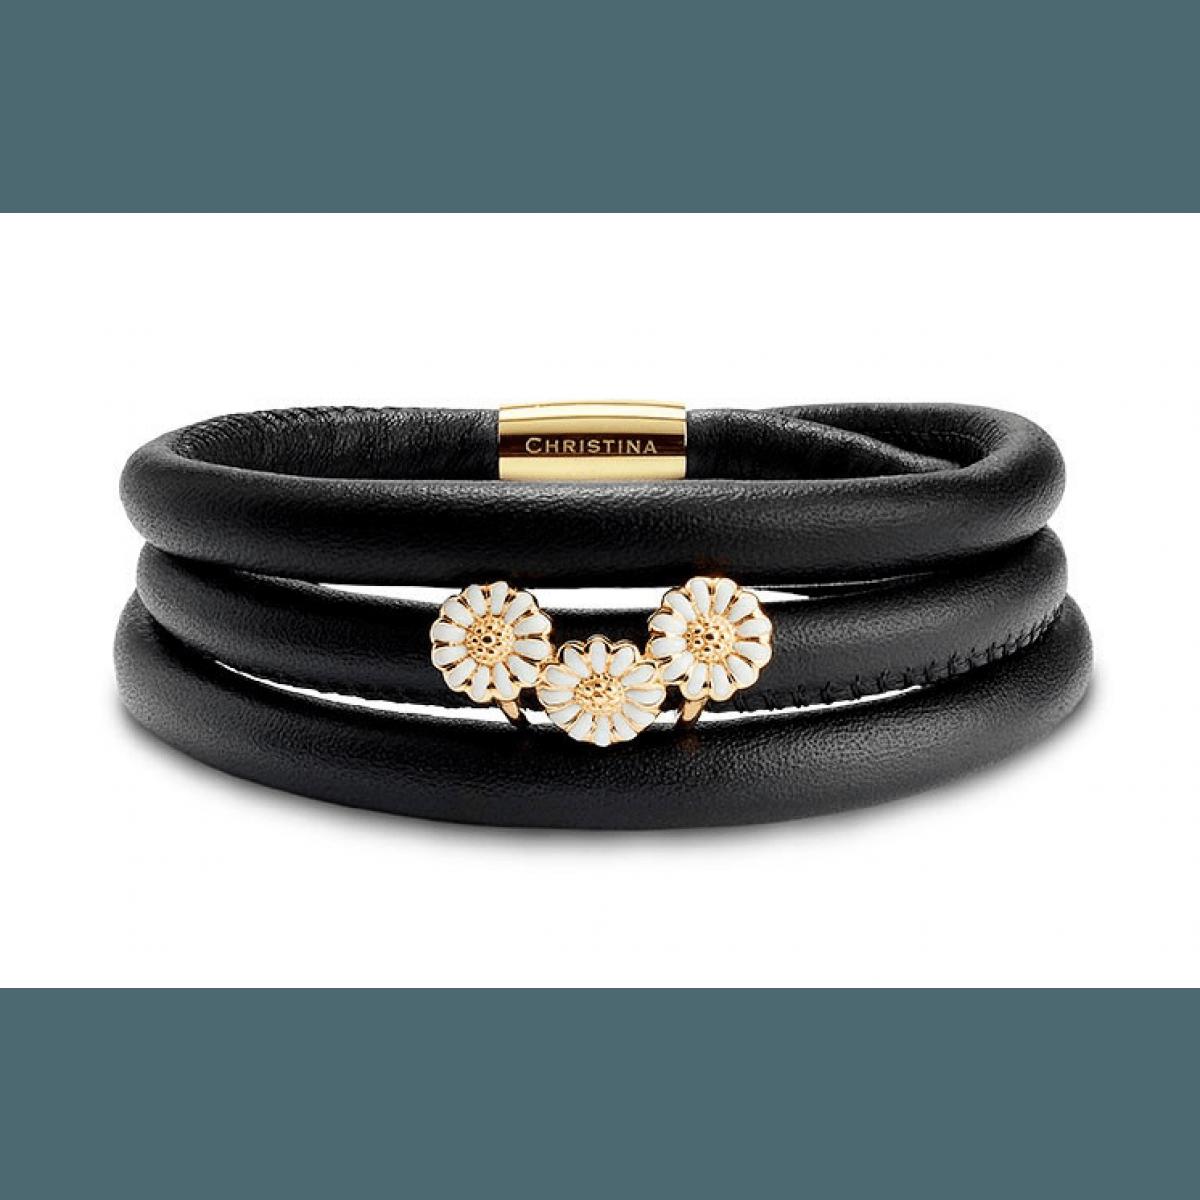 Christina Jewelry & Watches kampagne læderarmbånd inkl. forgyldt marguerit-charm - Christina ...